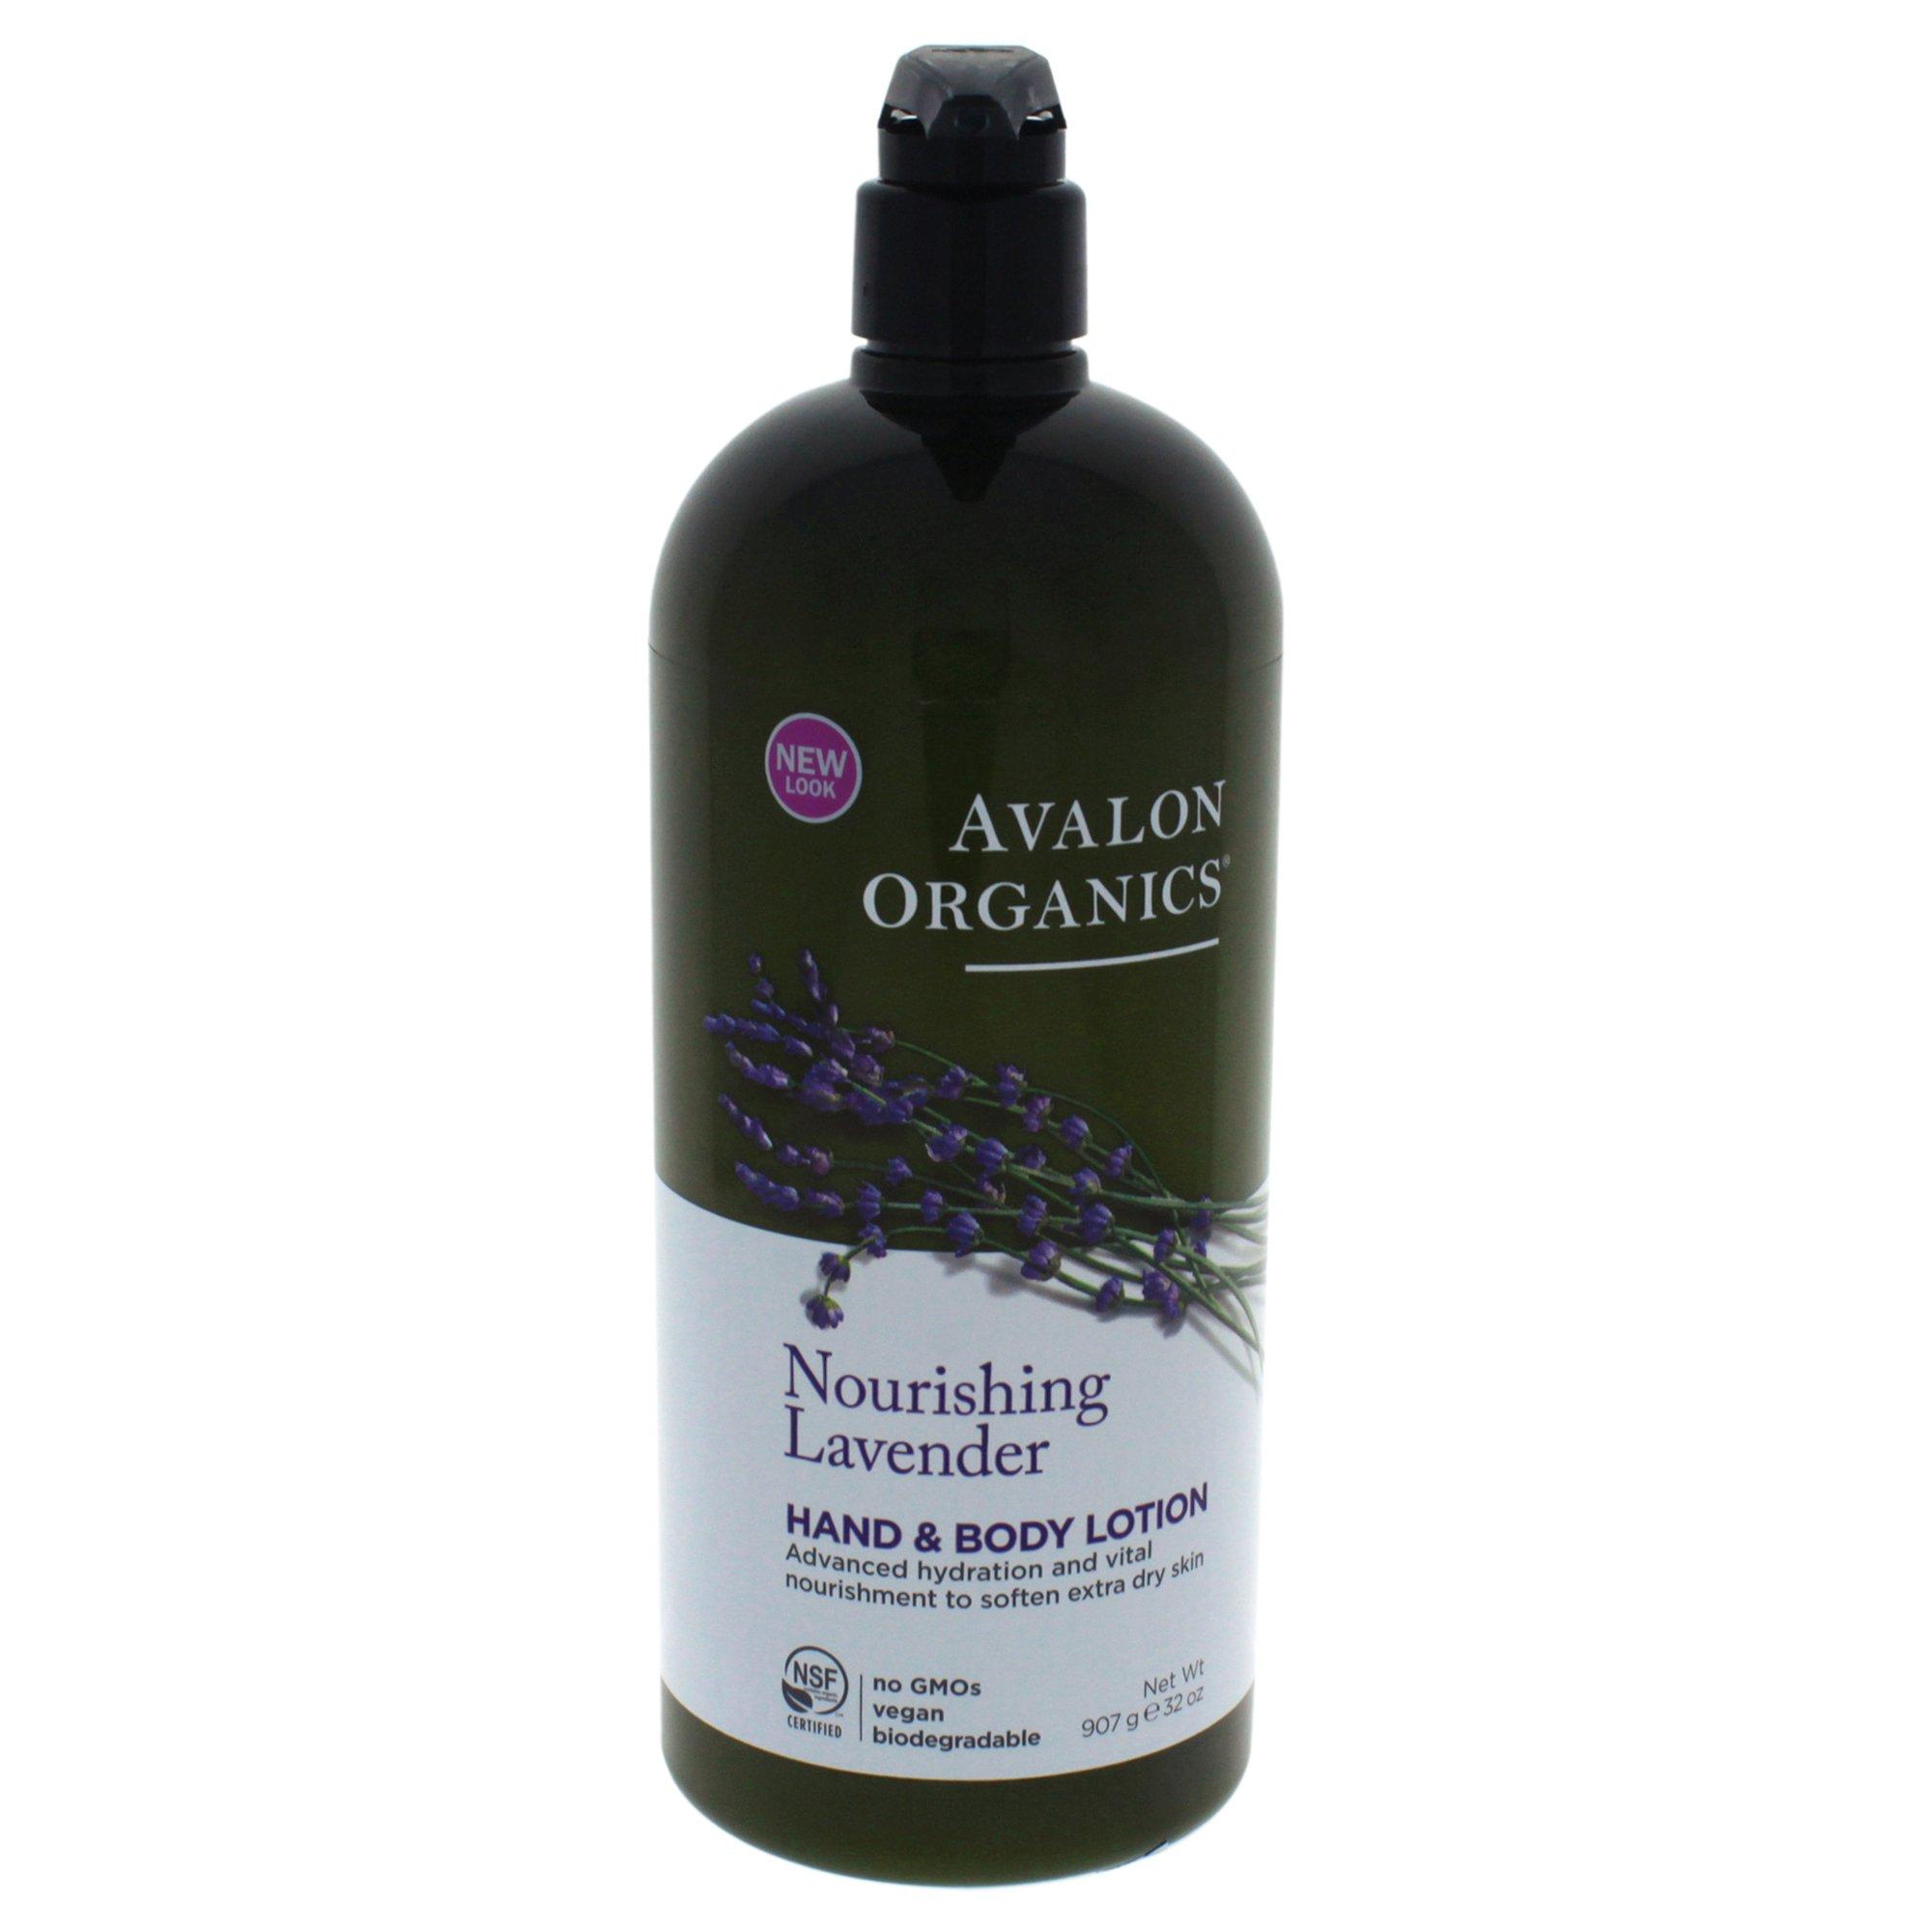 Avalon Organics Hand & Body Lotion, Nourishing Lavender, 32 Ounce